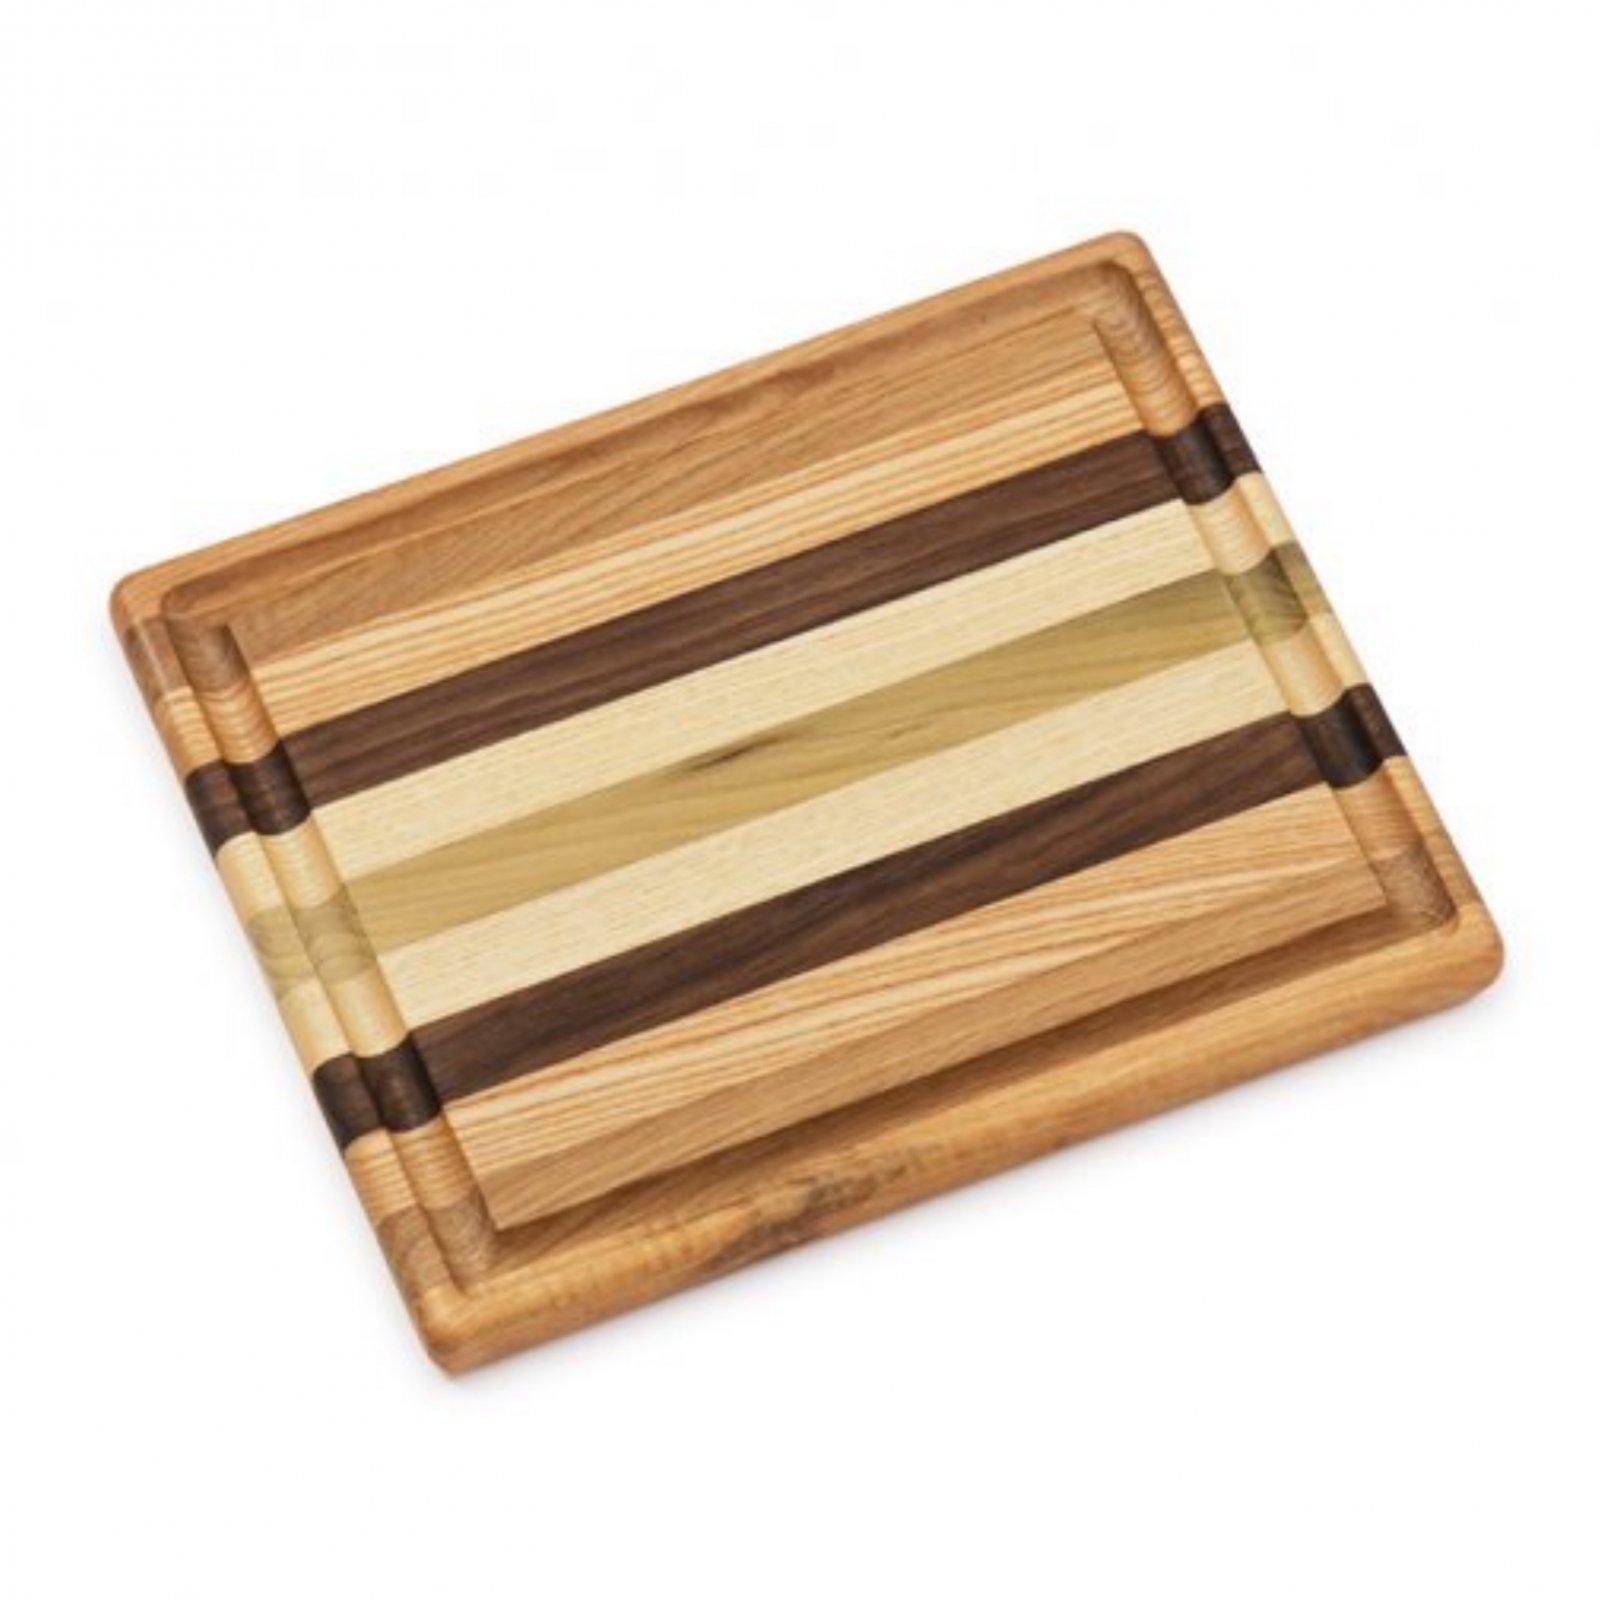 Dickinson Classic Cutting Board